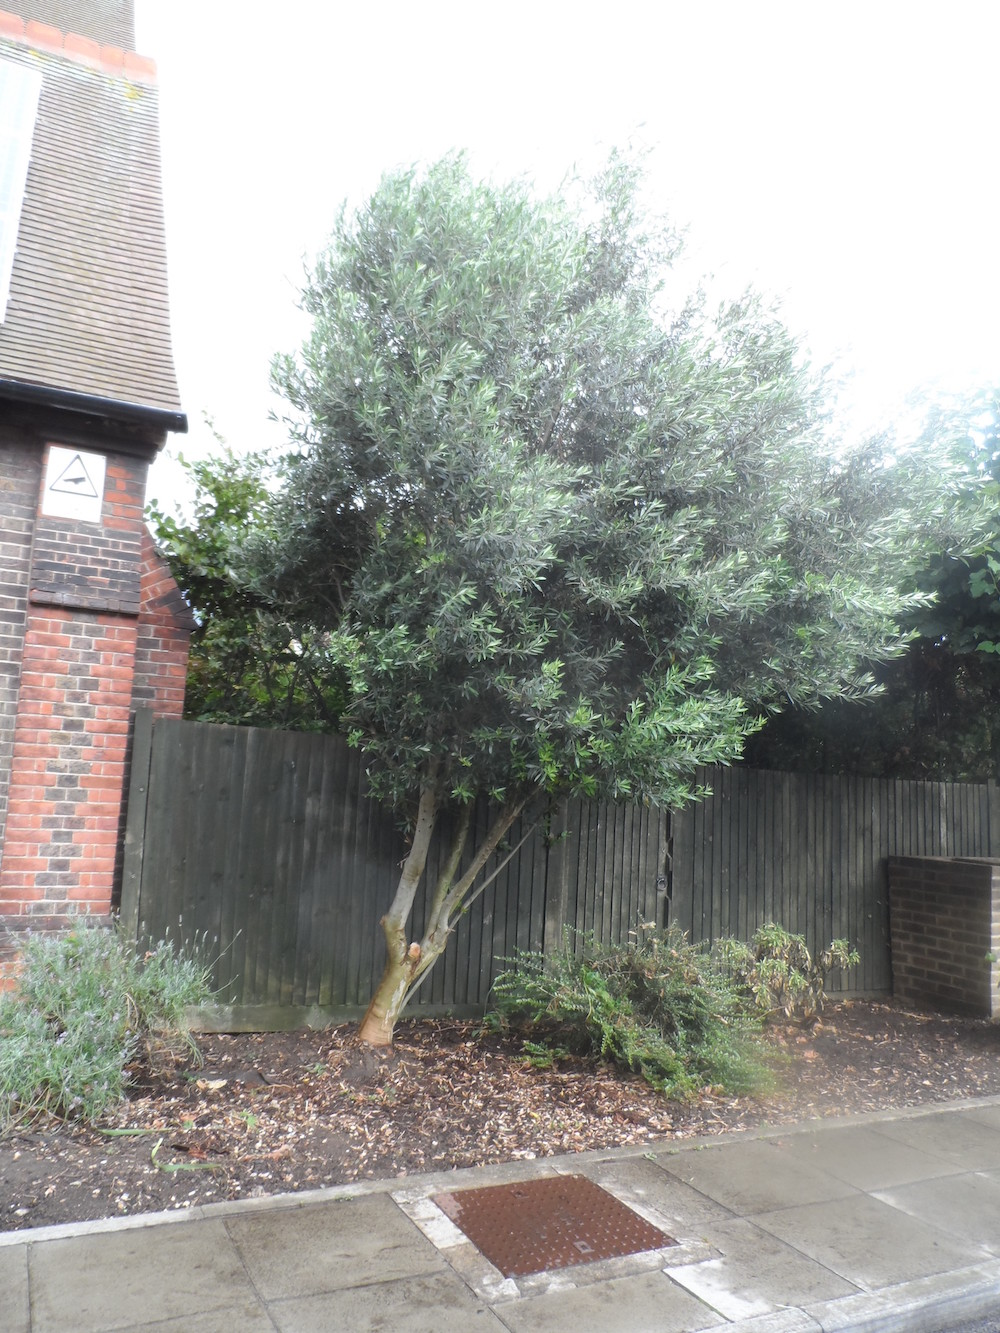 churchyard Olive tree